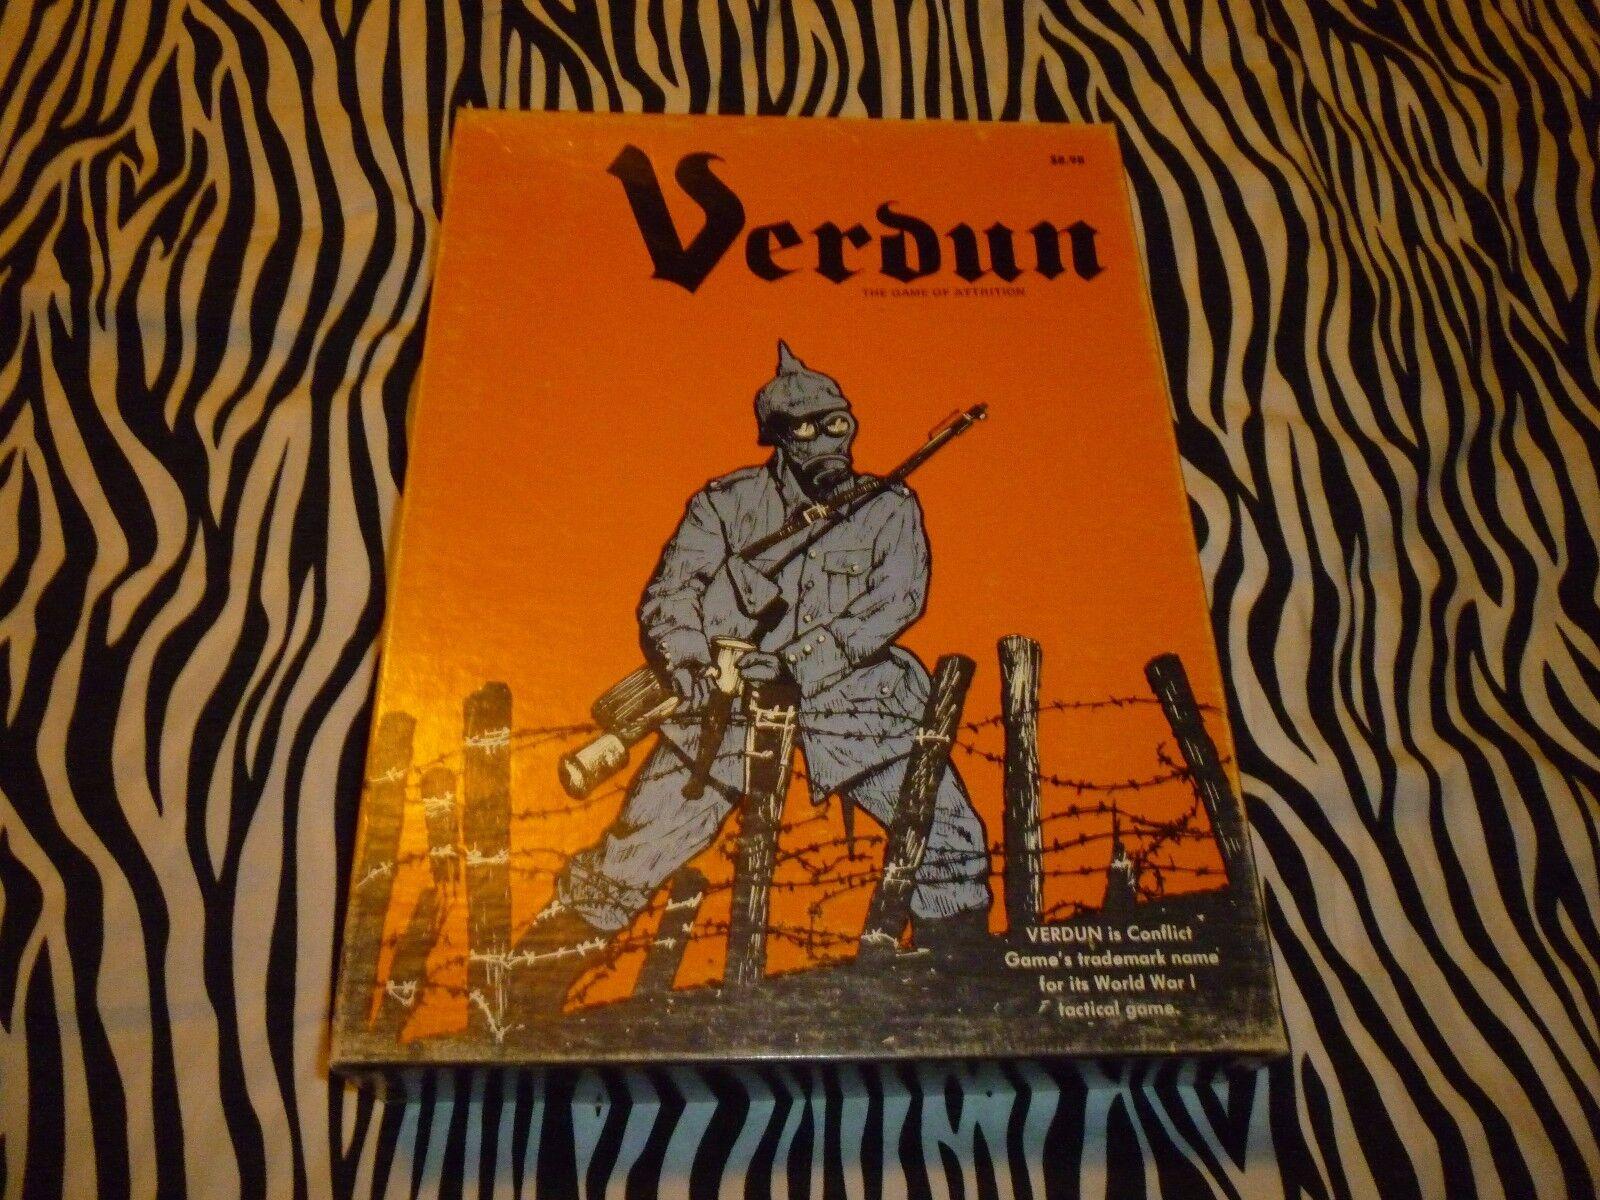 Verdun Vintage War Board Game